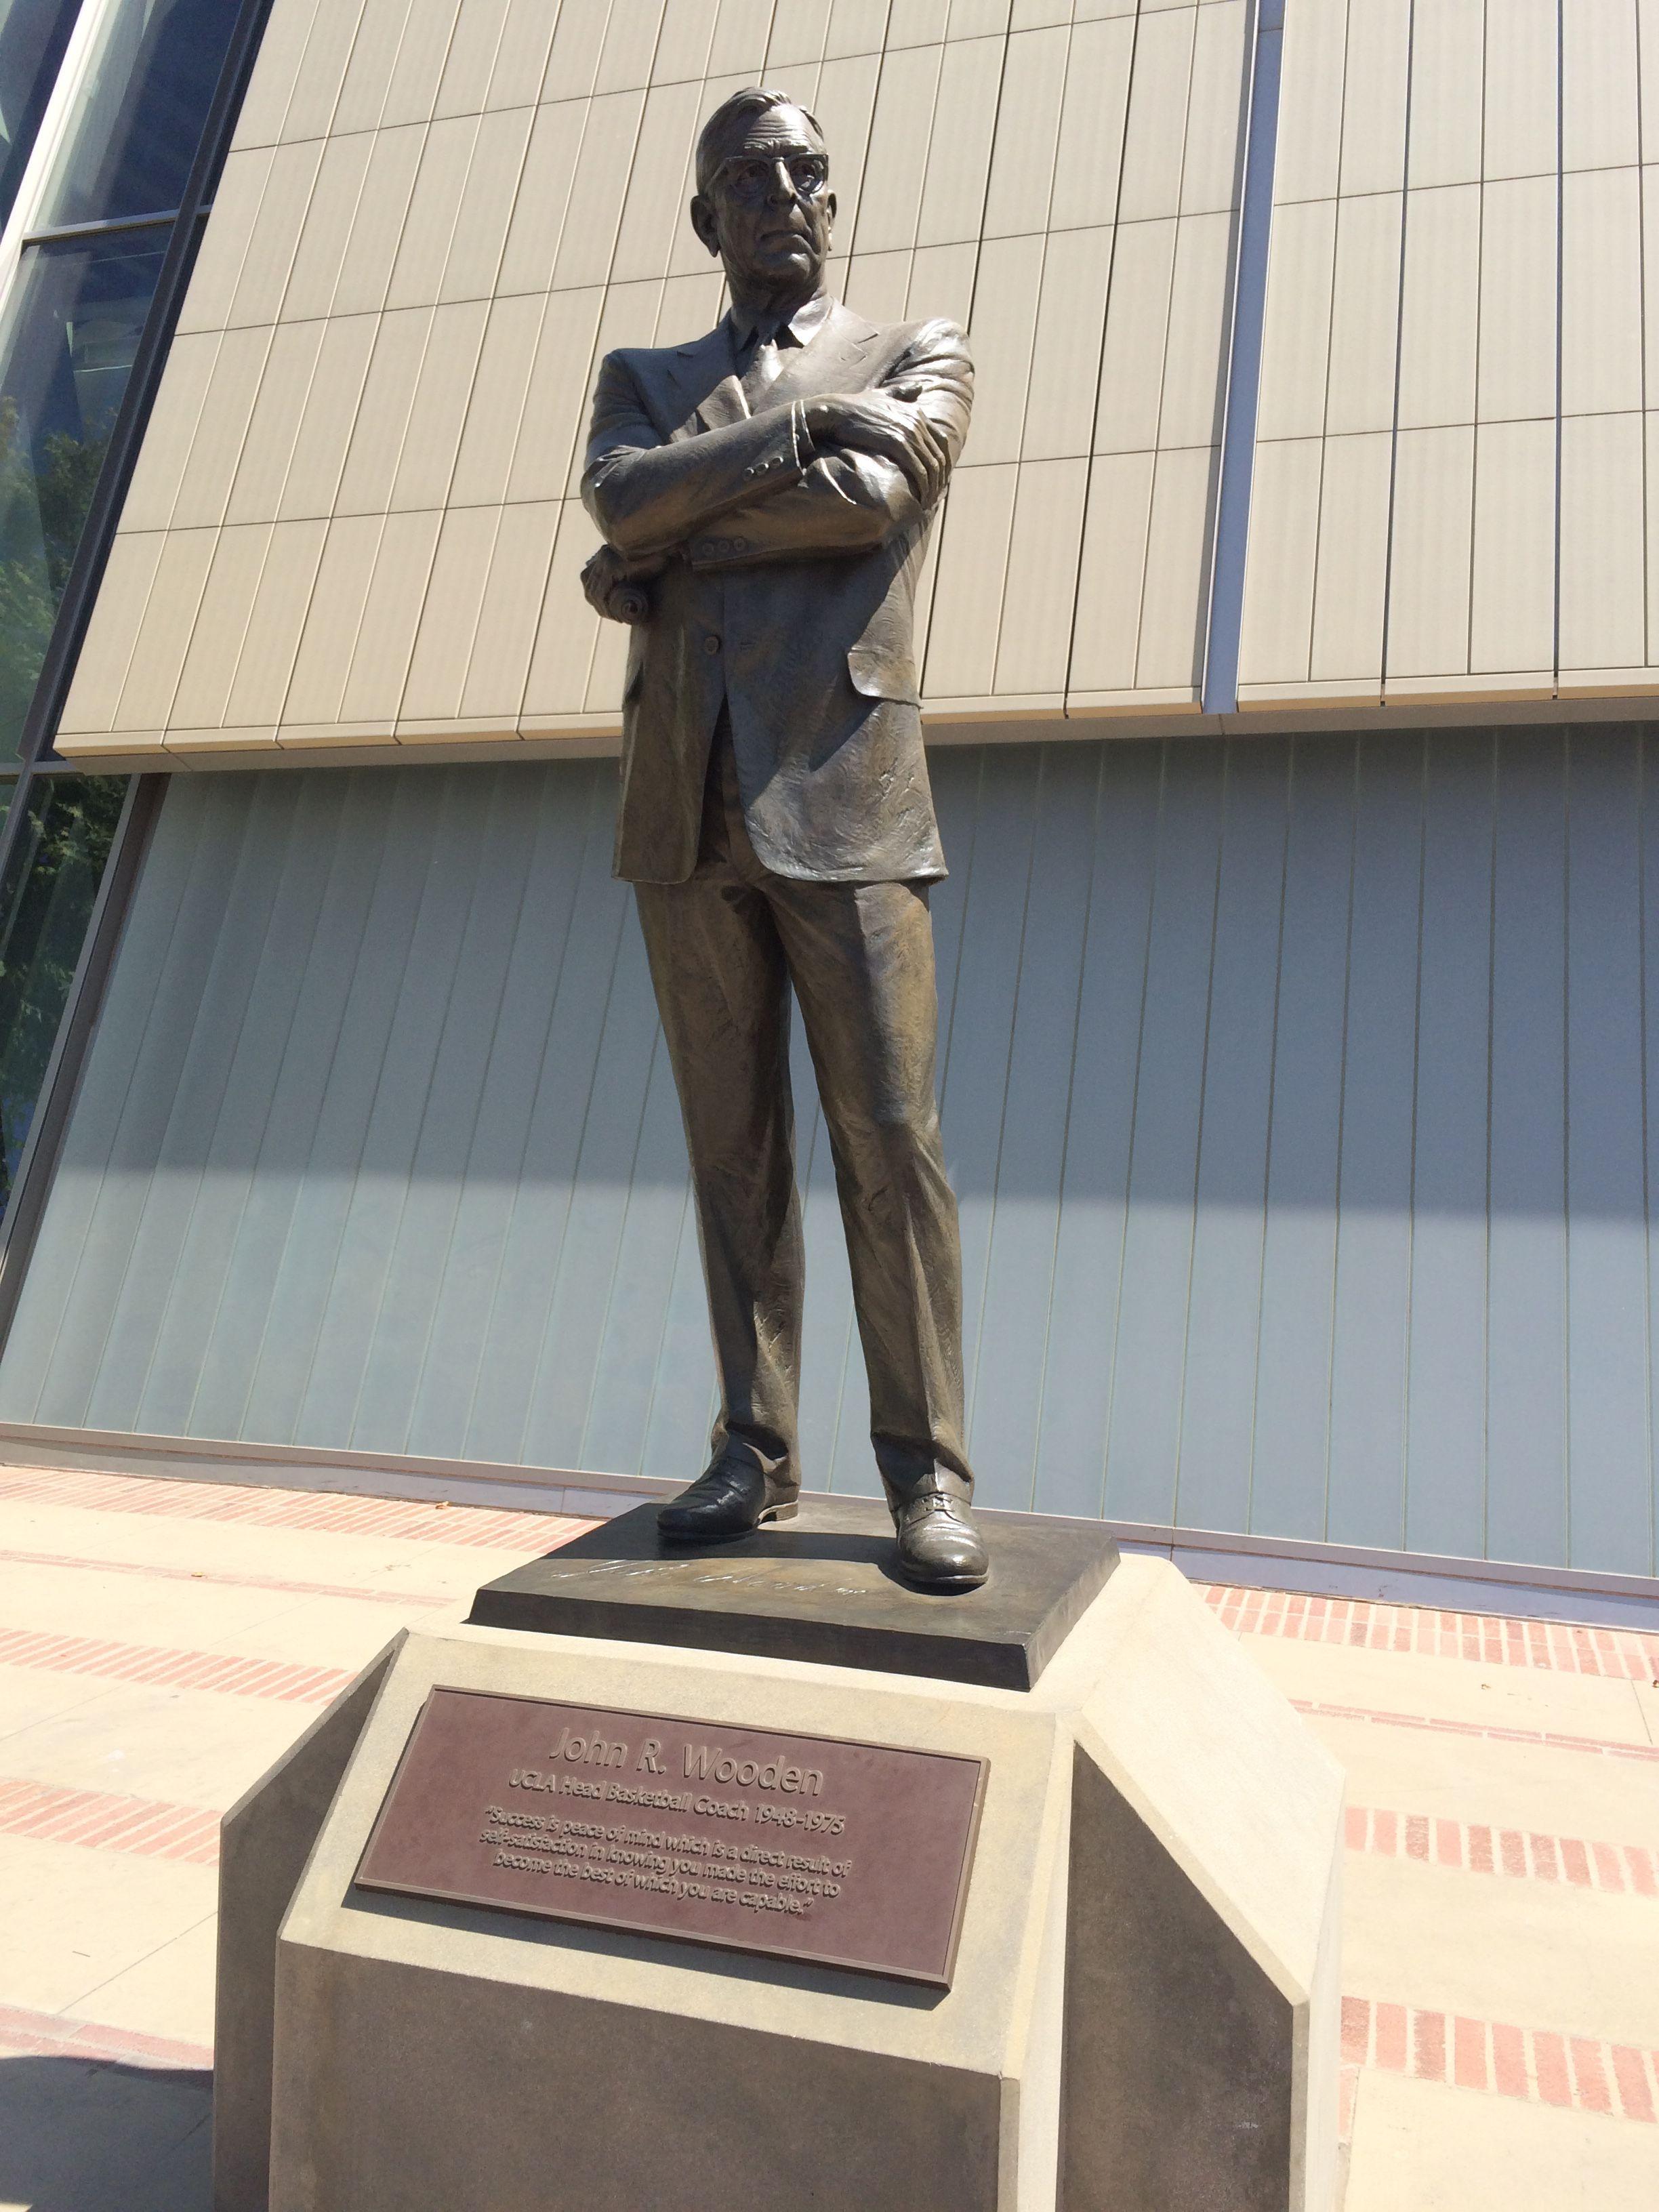 The John Wooden Statue